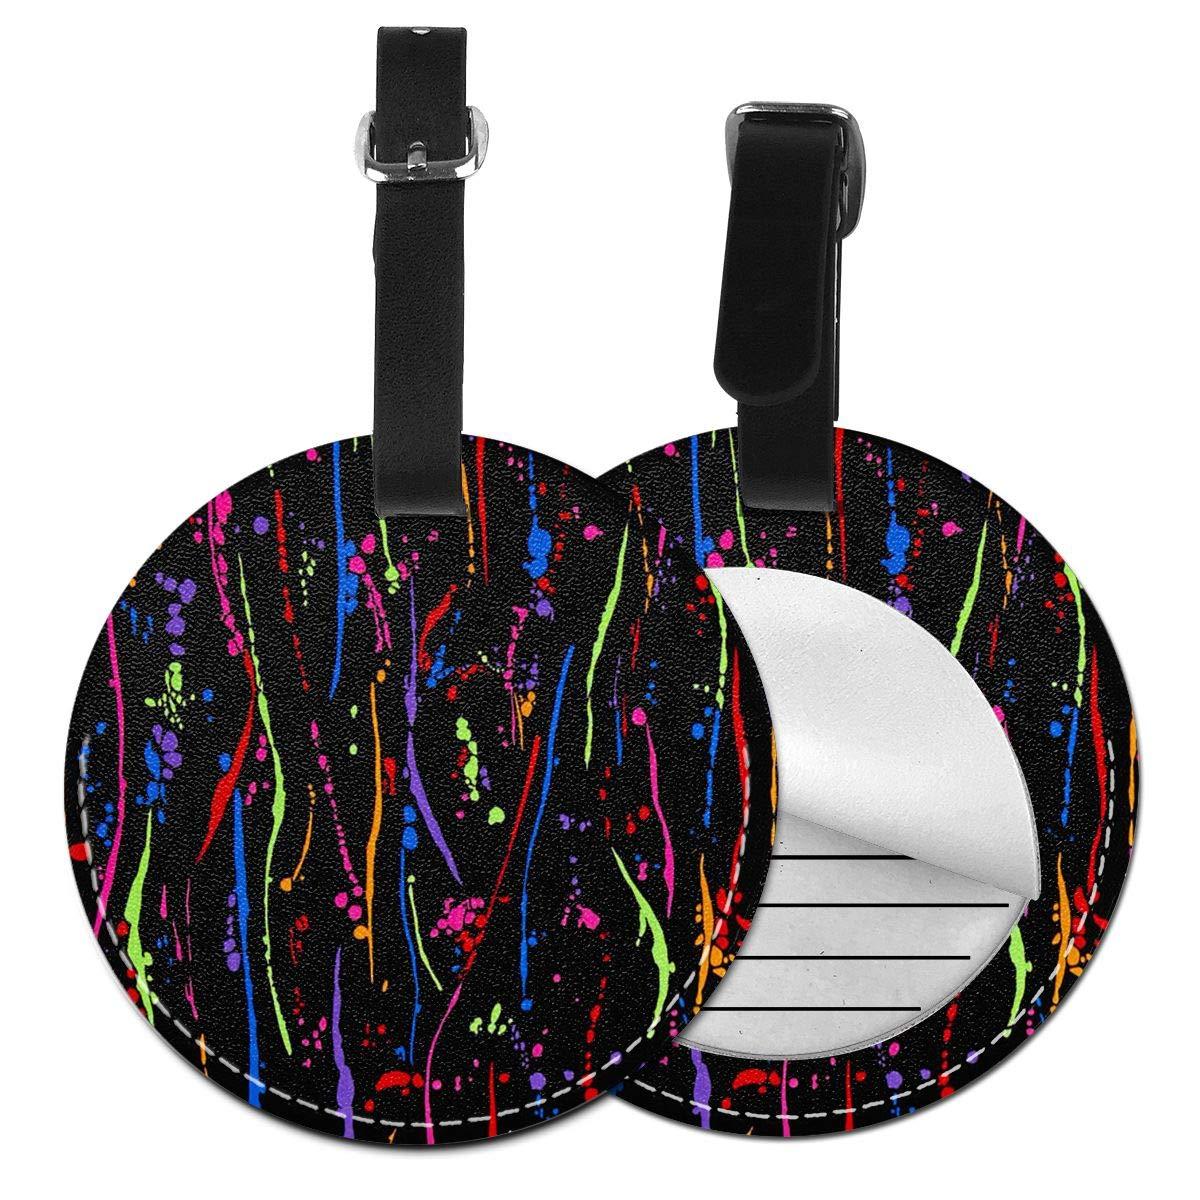 Free-2 Rainbow Bright Paint Splatter Luggage Tag 3D Print Leather Travel Bag ID Card